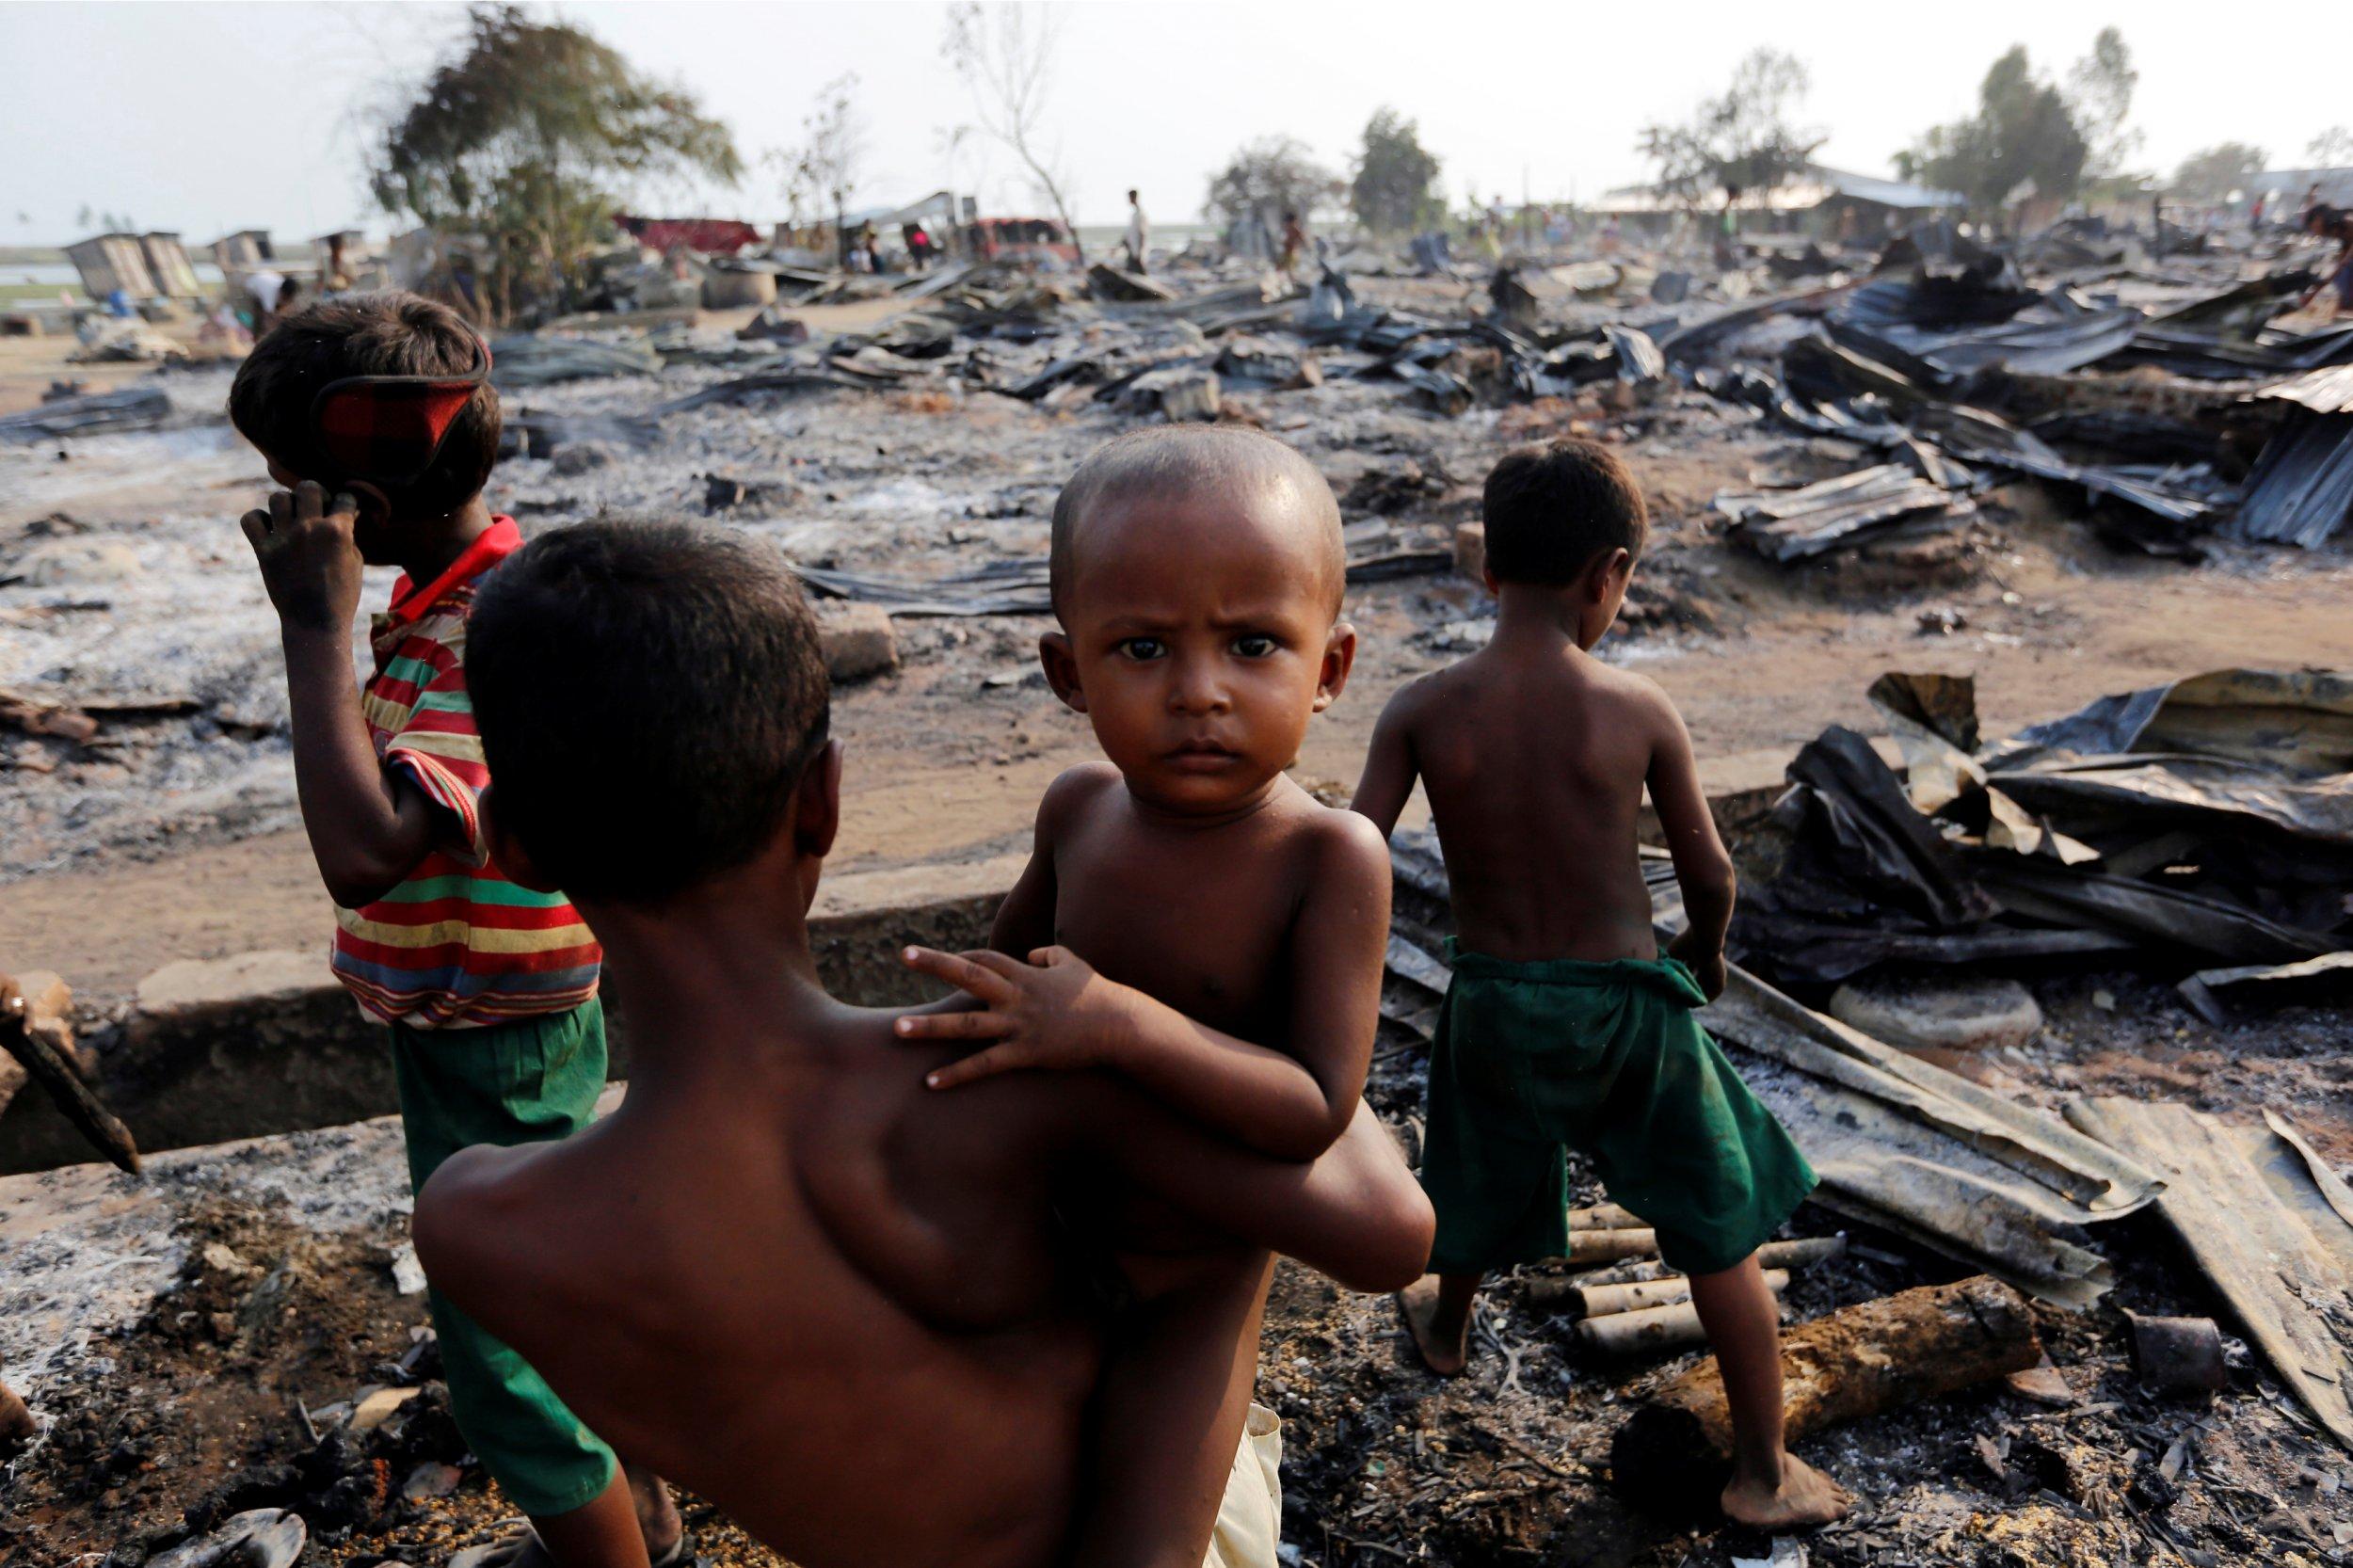 Camp for internally displaced Rohingya Muslims in Myanmar